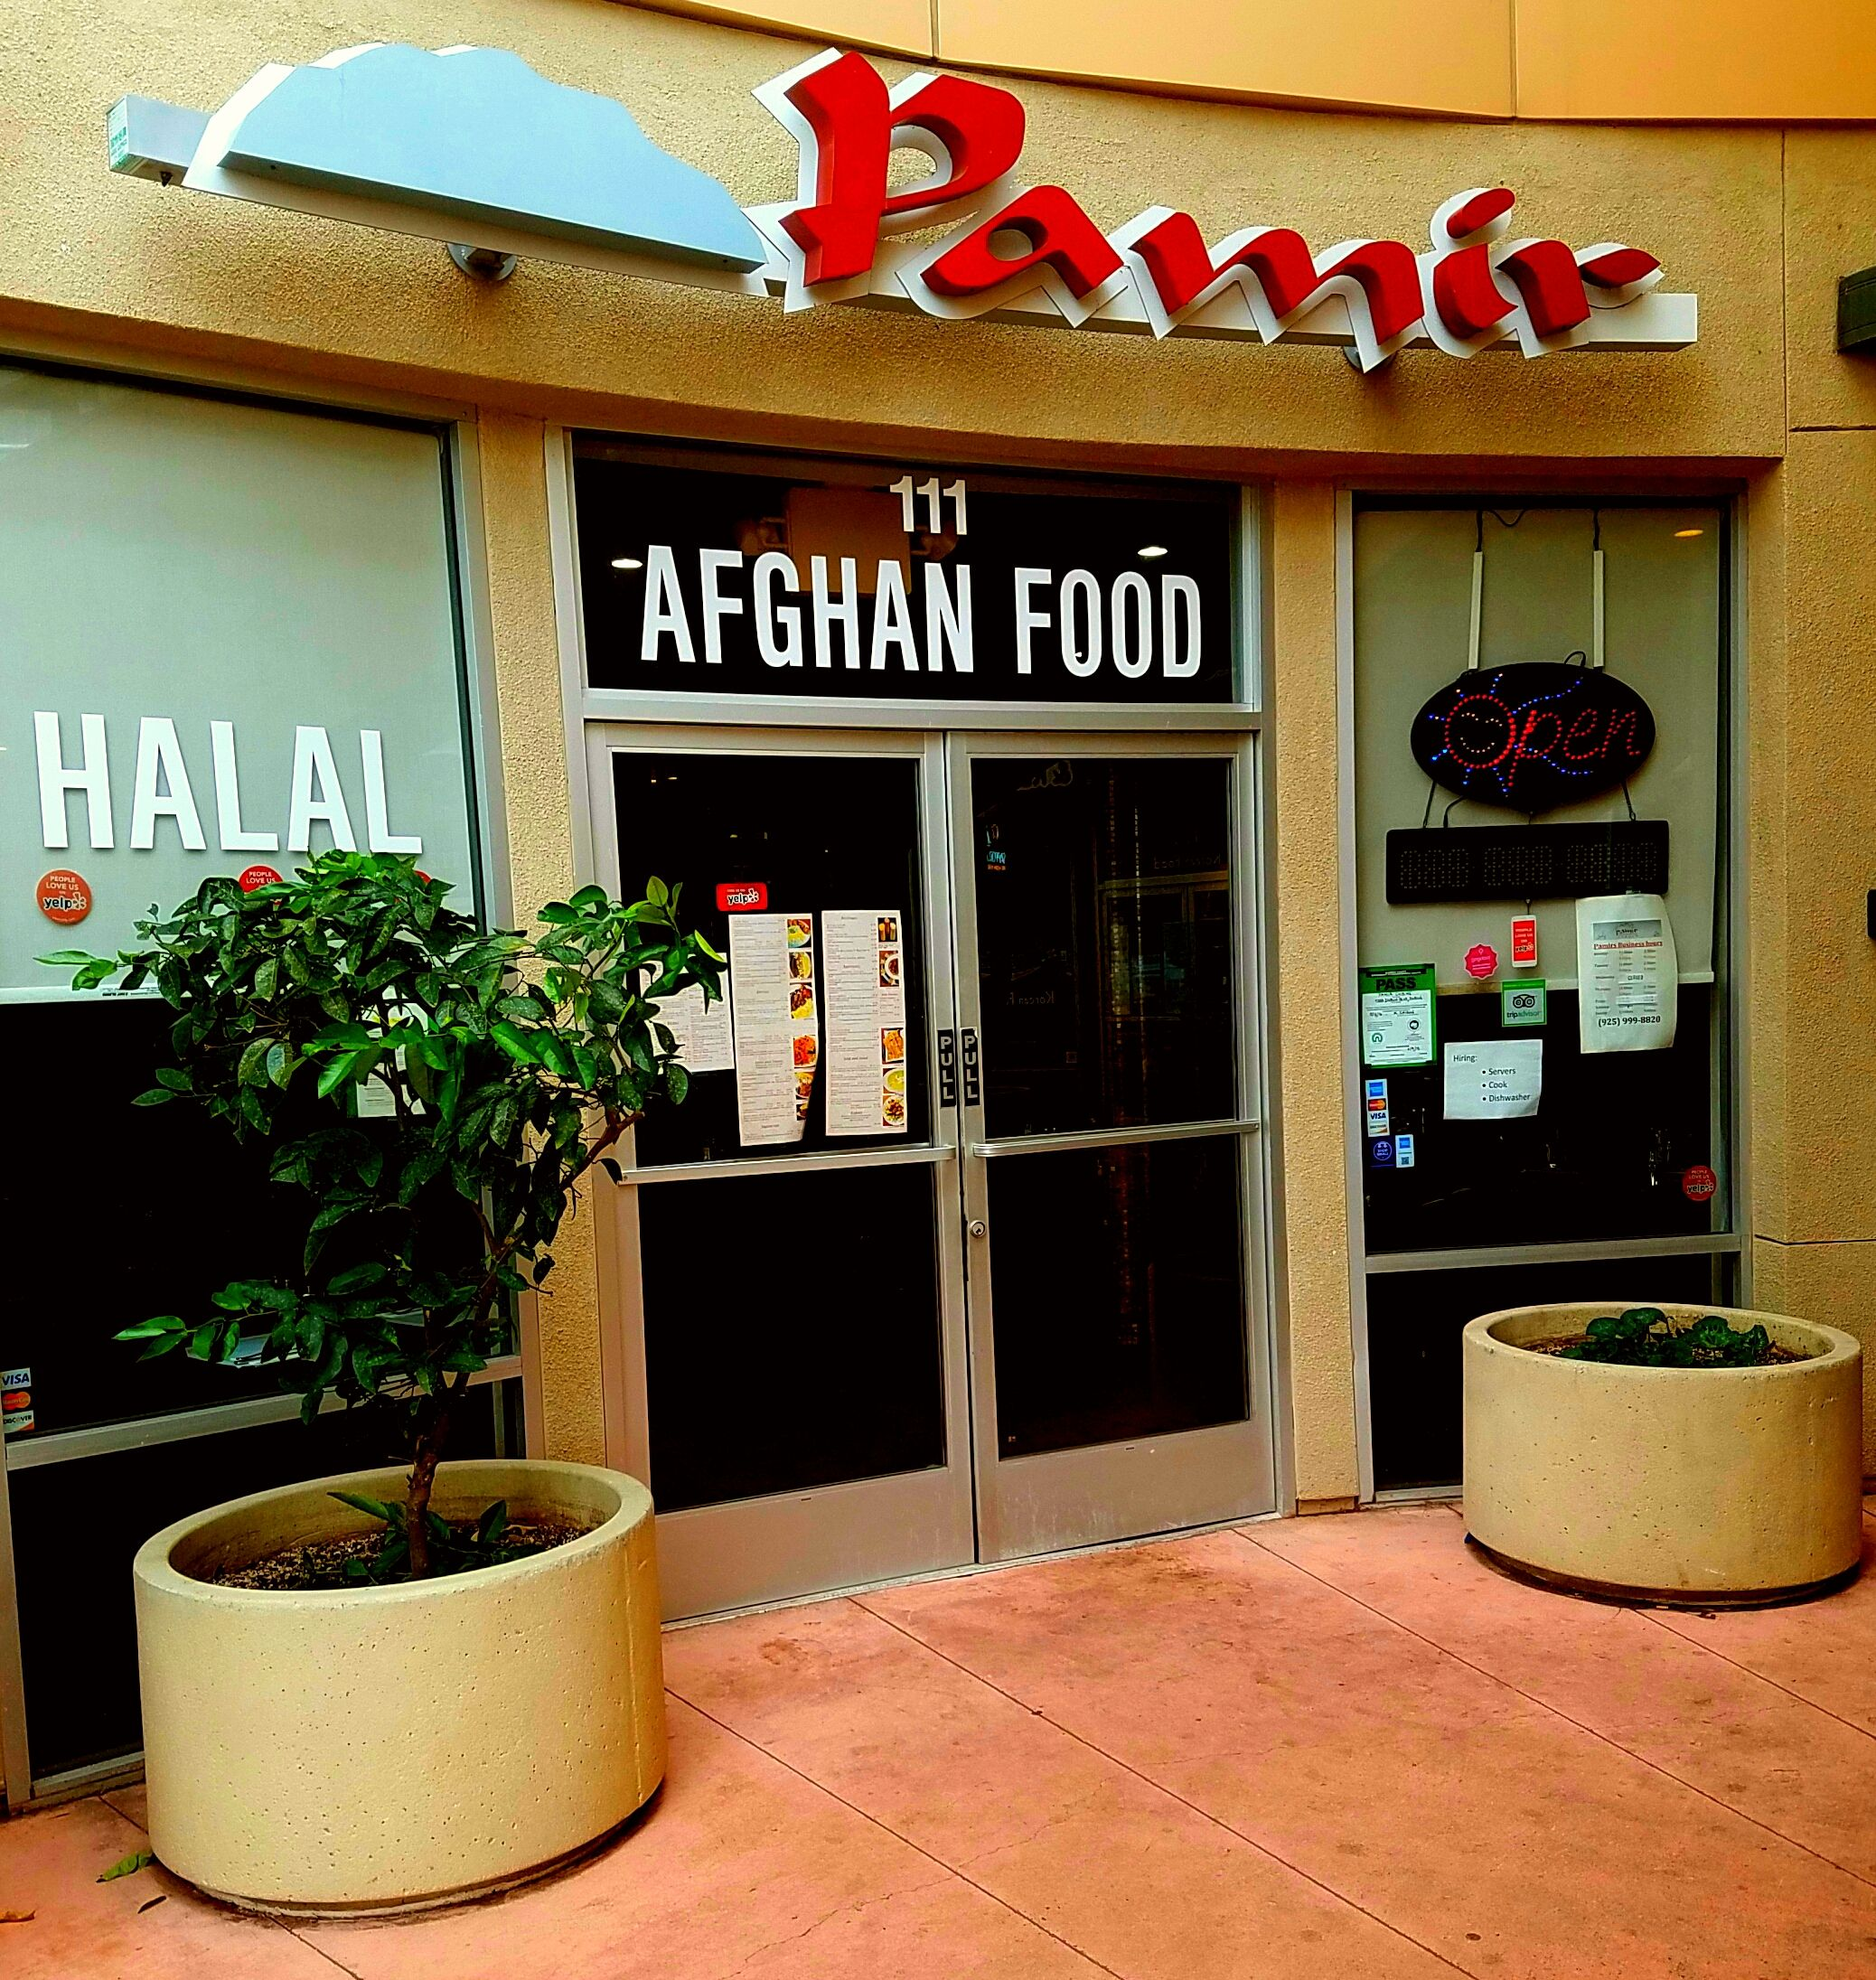 Dublin halal food restaurant